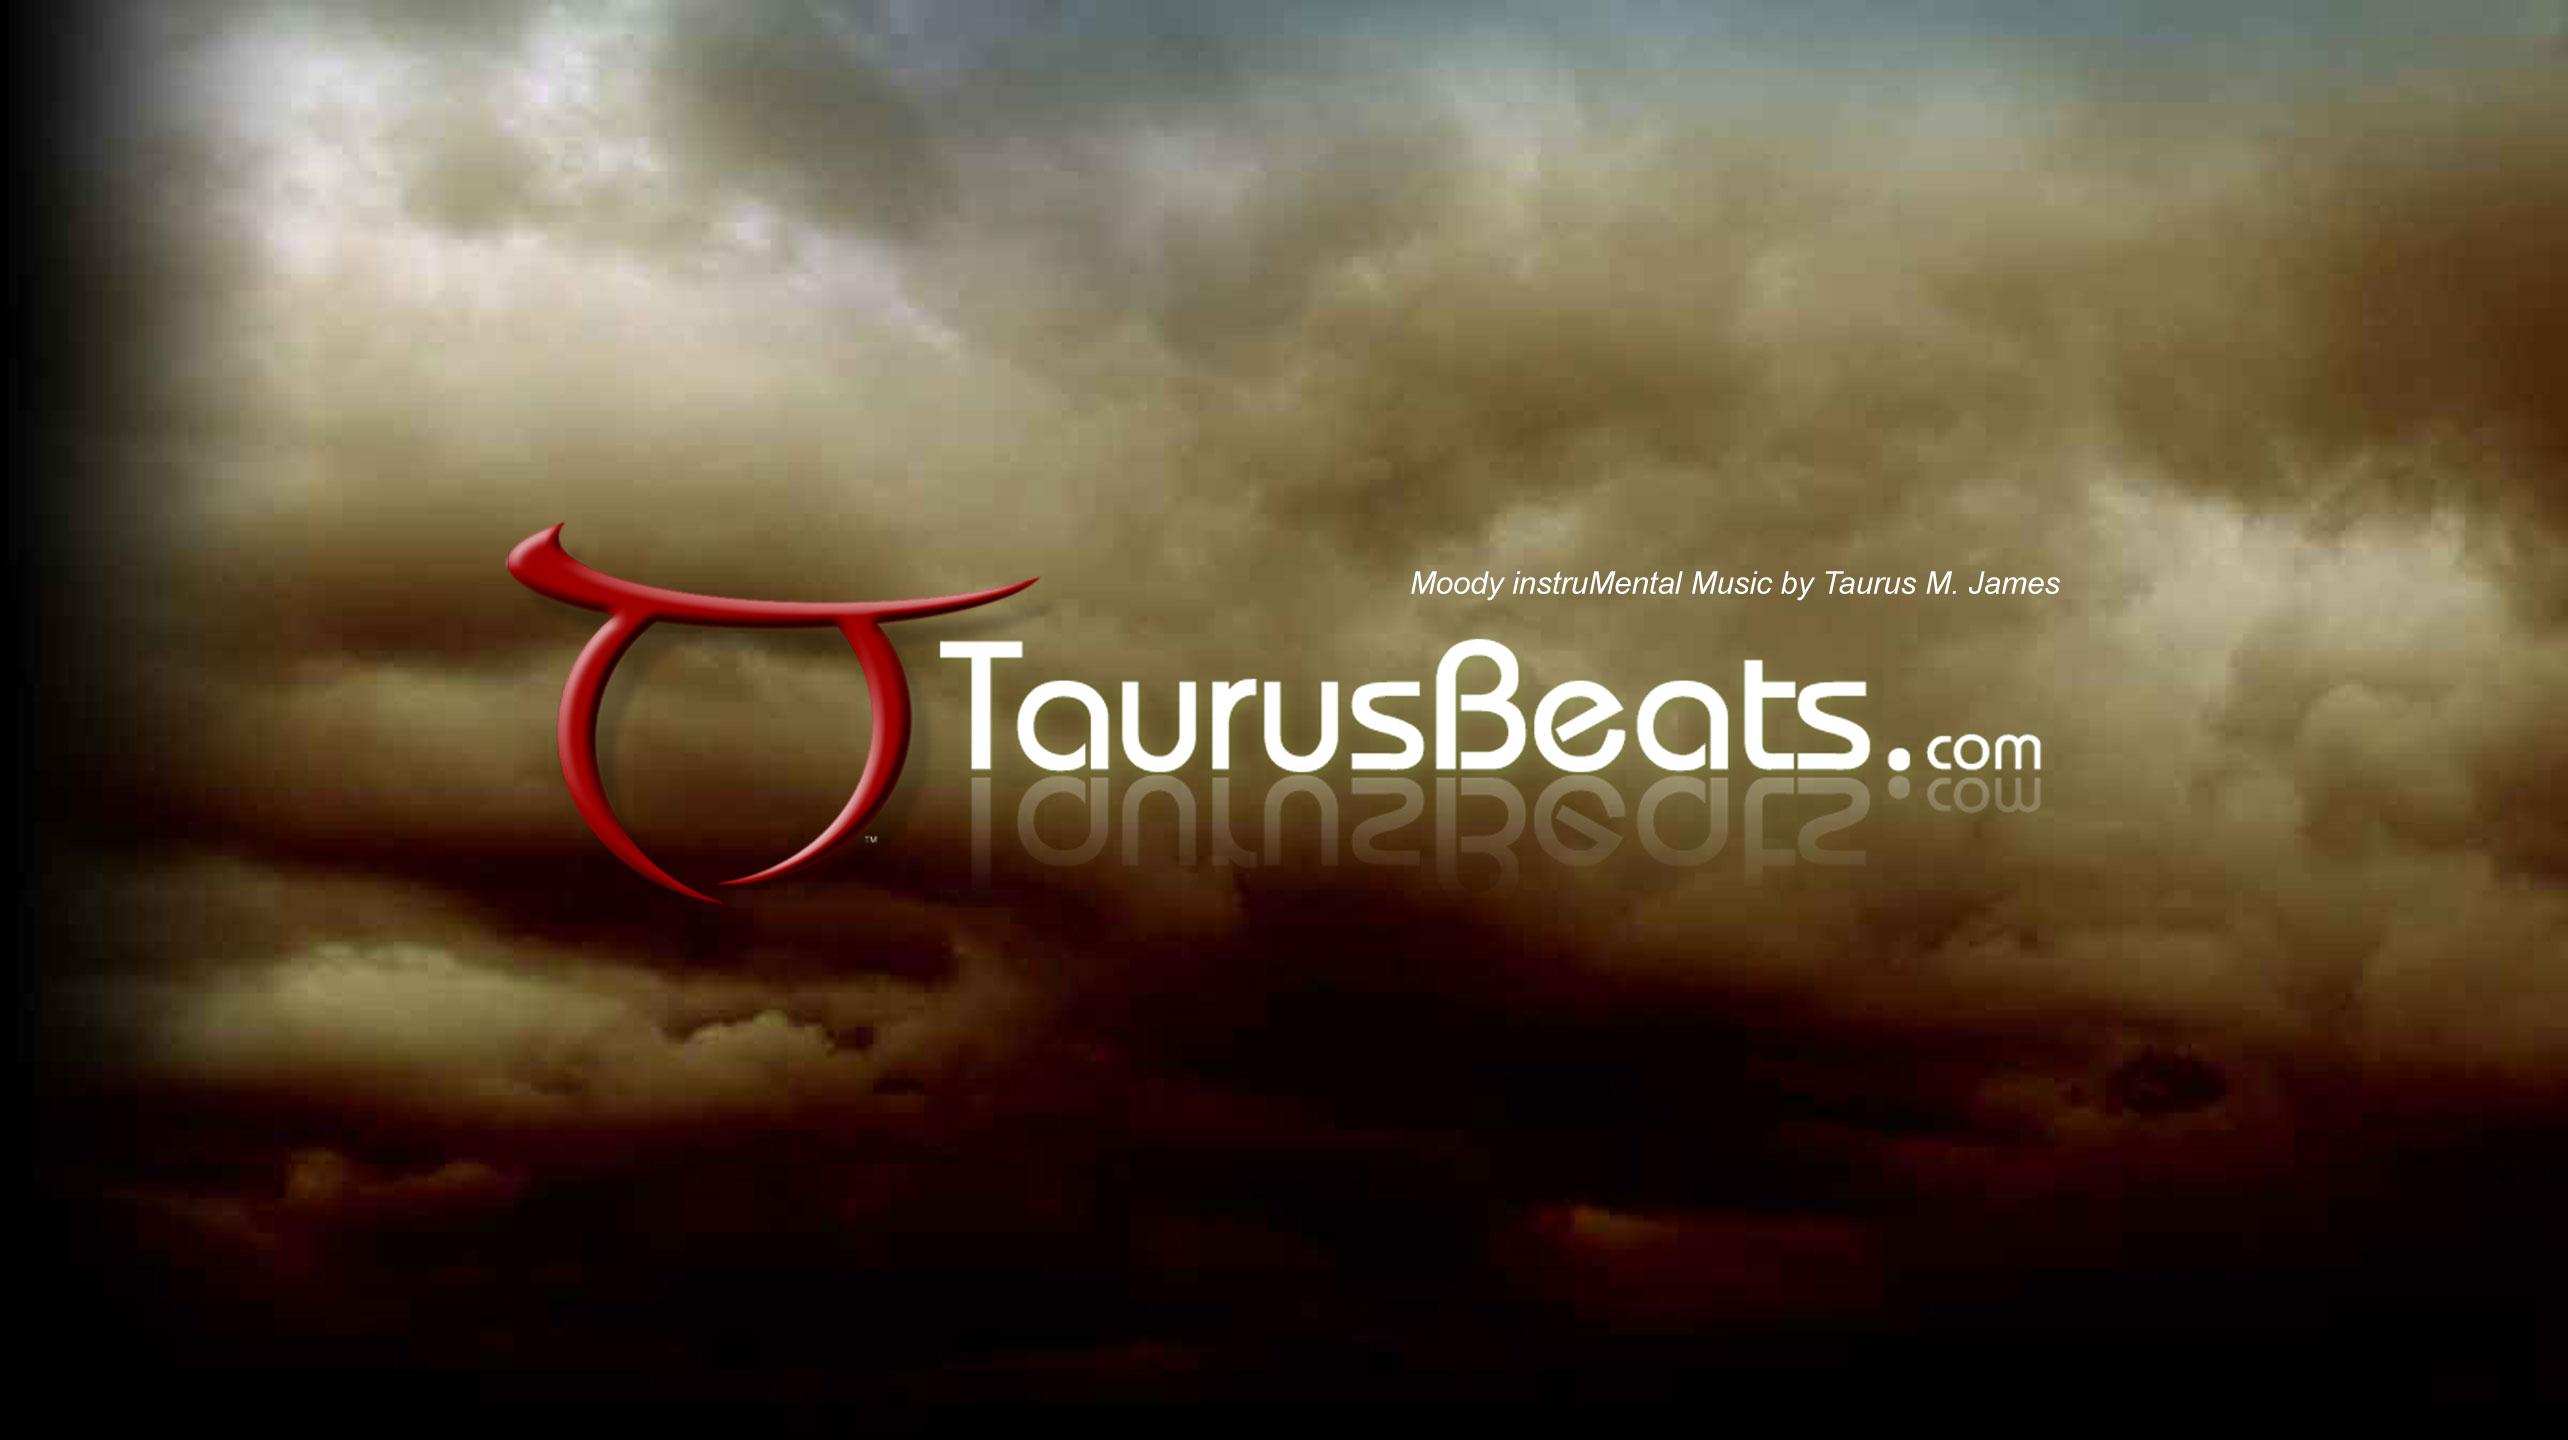 TaurusBeats video intro image of TaurusBeats.com logo in storm clouds